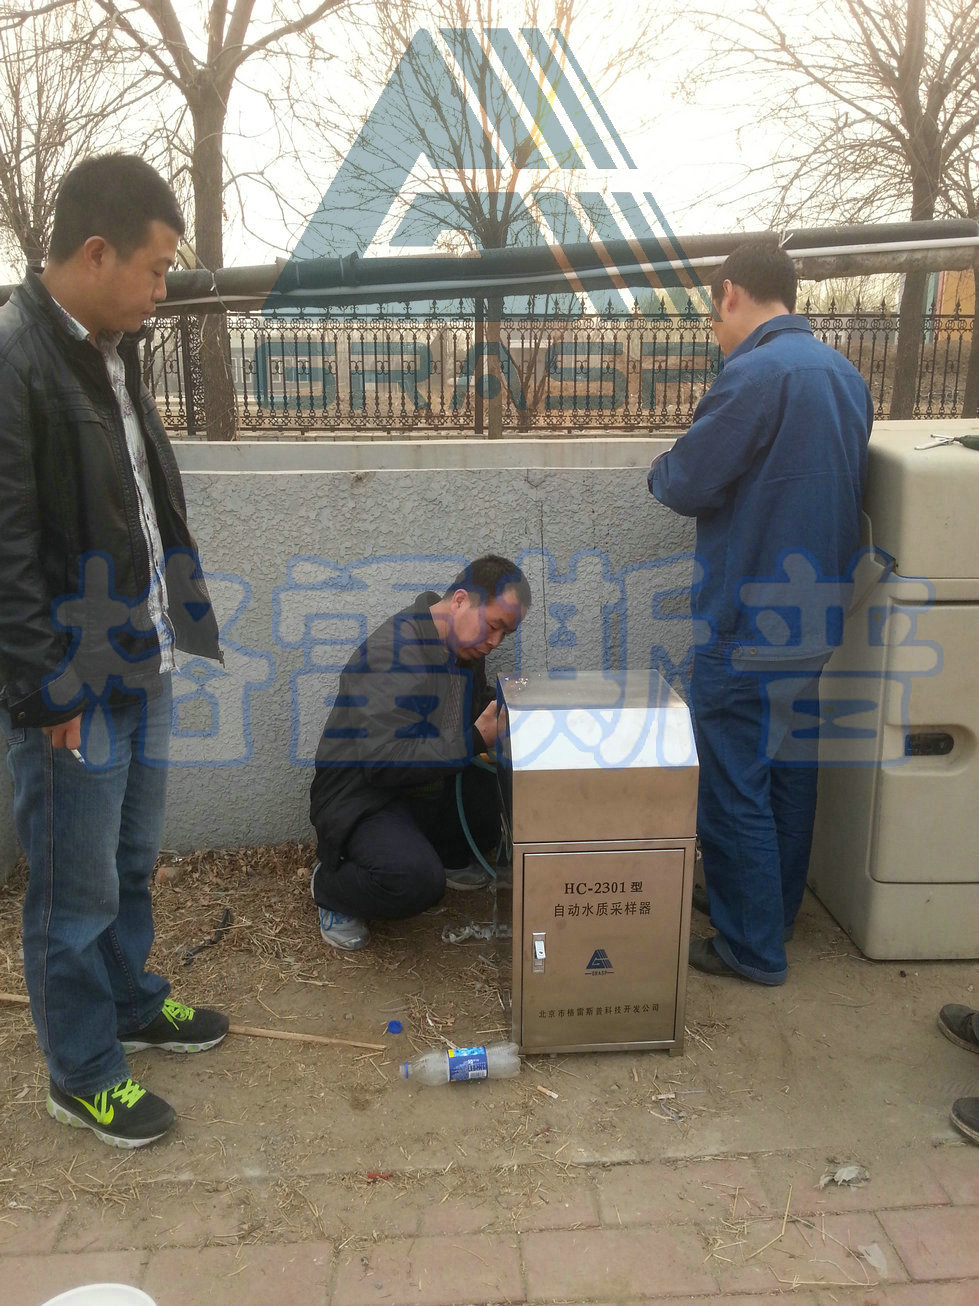 HC-2301固定水质采样器安装现场